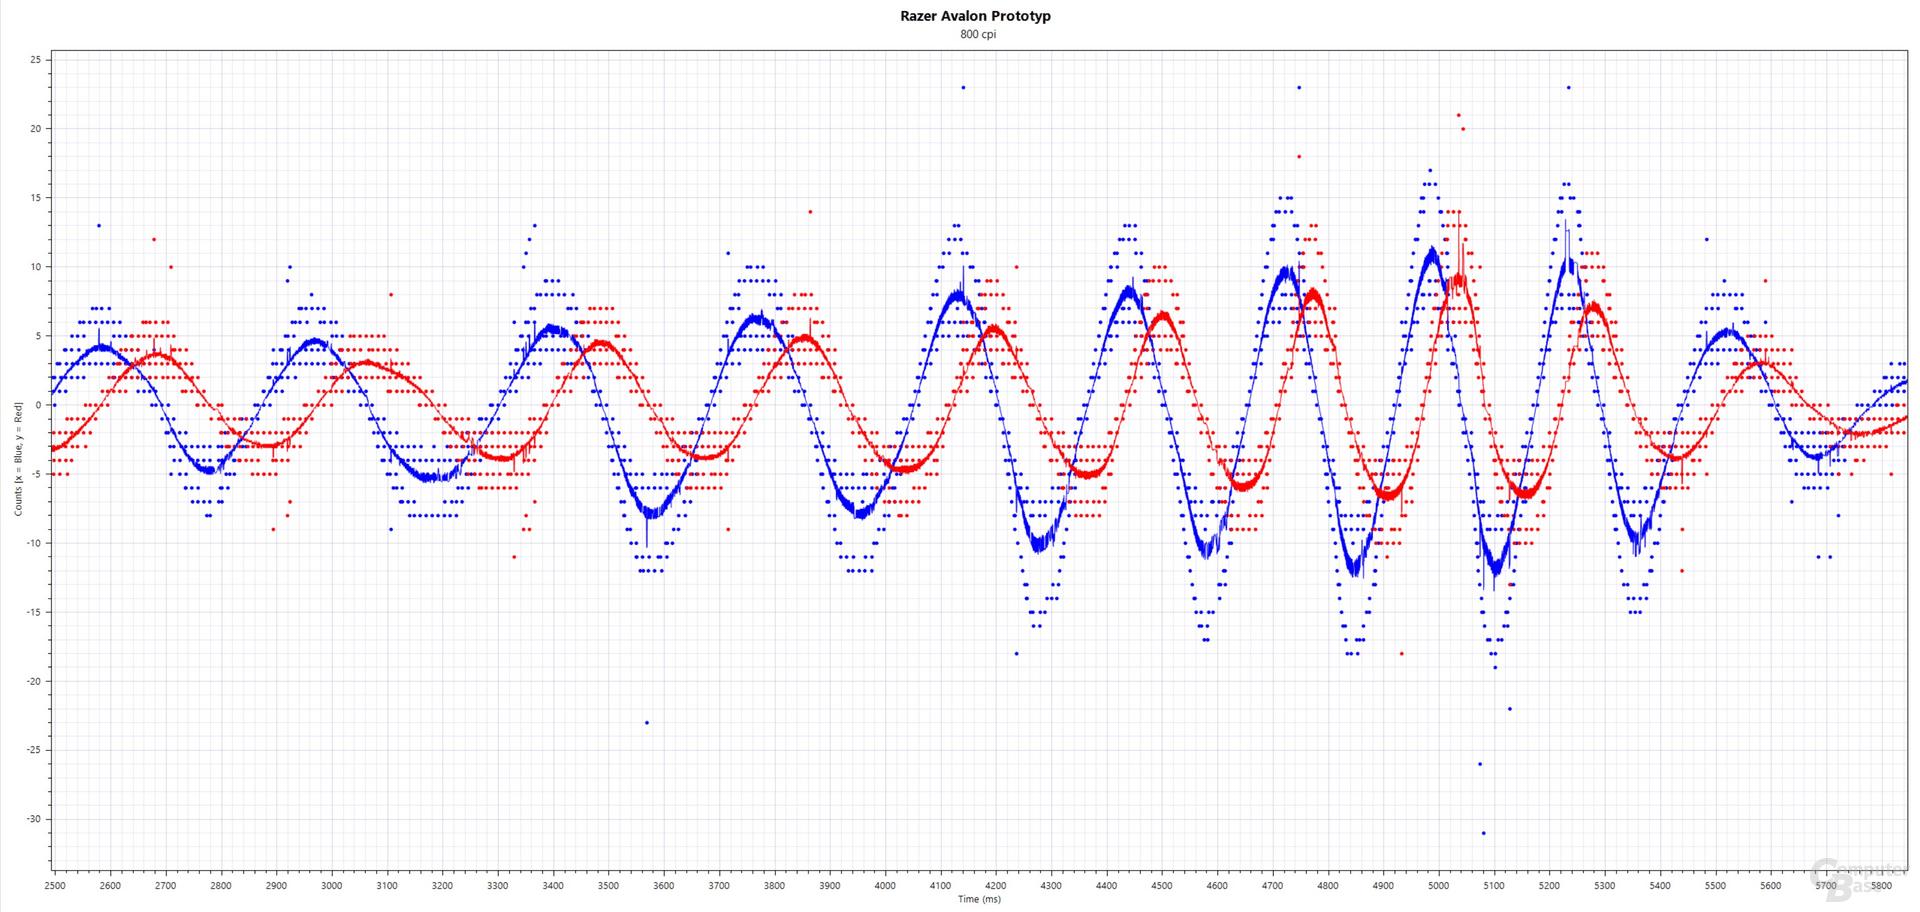 Blau: xCounts(ms), Rot: yCounts(ms); Razer Avalon Prototyp (PixArt PMW-3399, 800 cpi, 8.000 Hertz, Stoffmauspad)